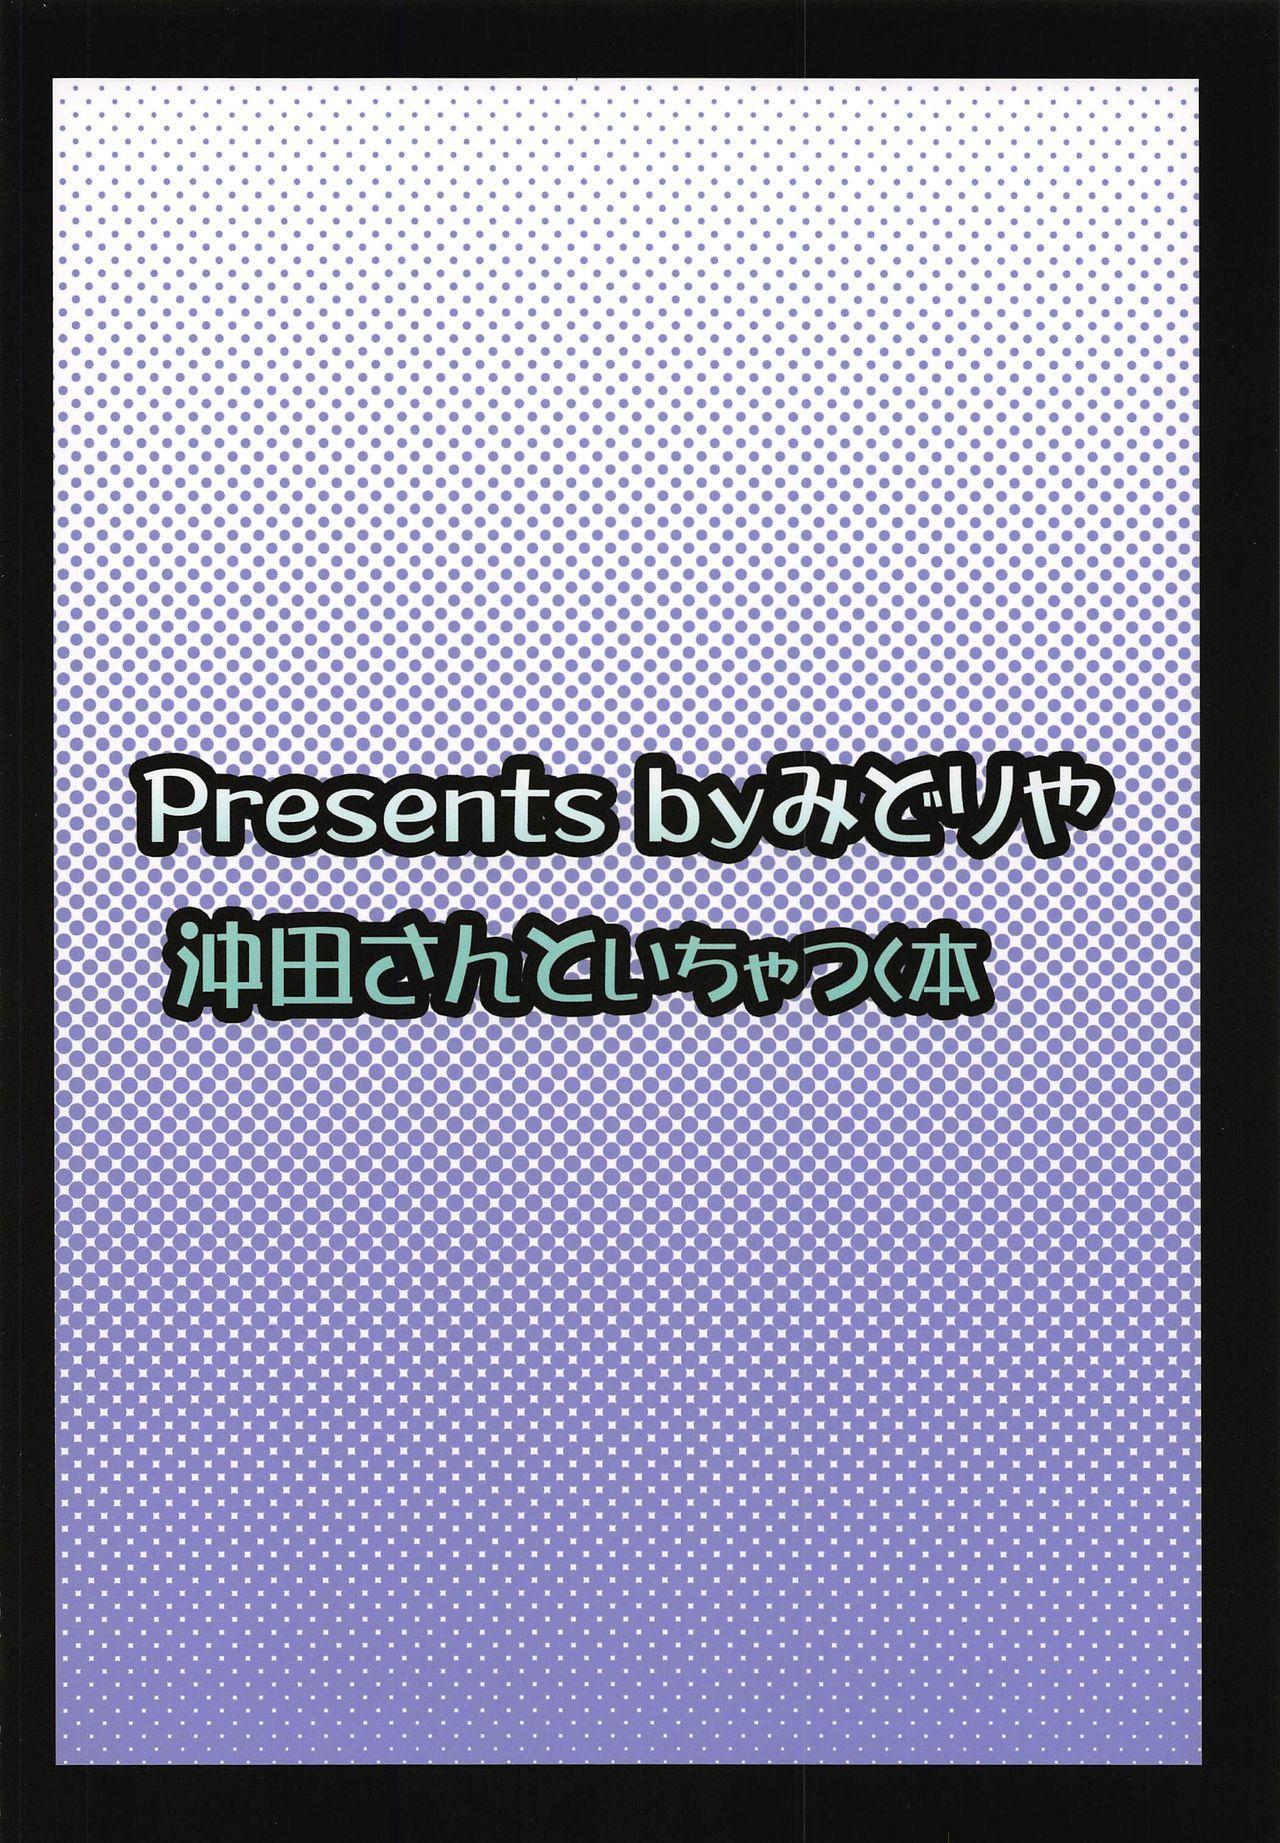 Okita-san to Ichatsuku Hon 21